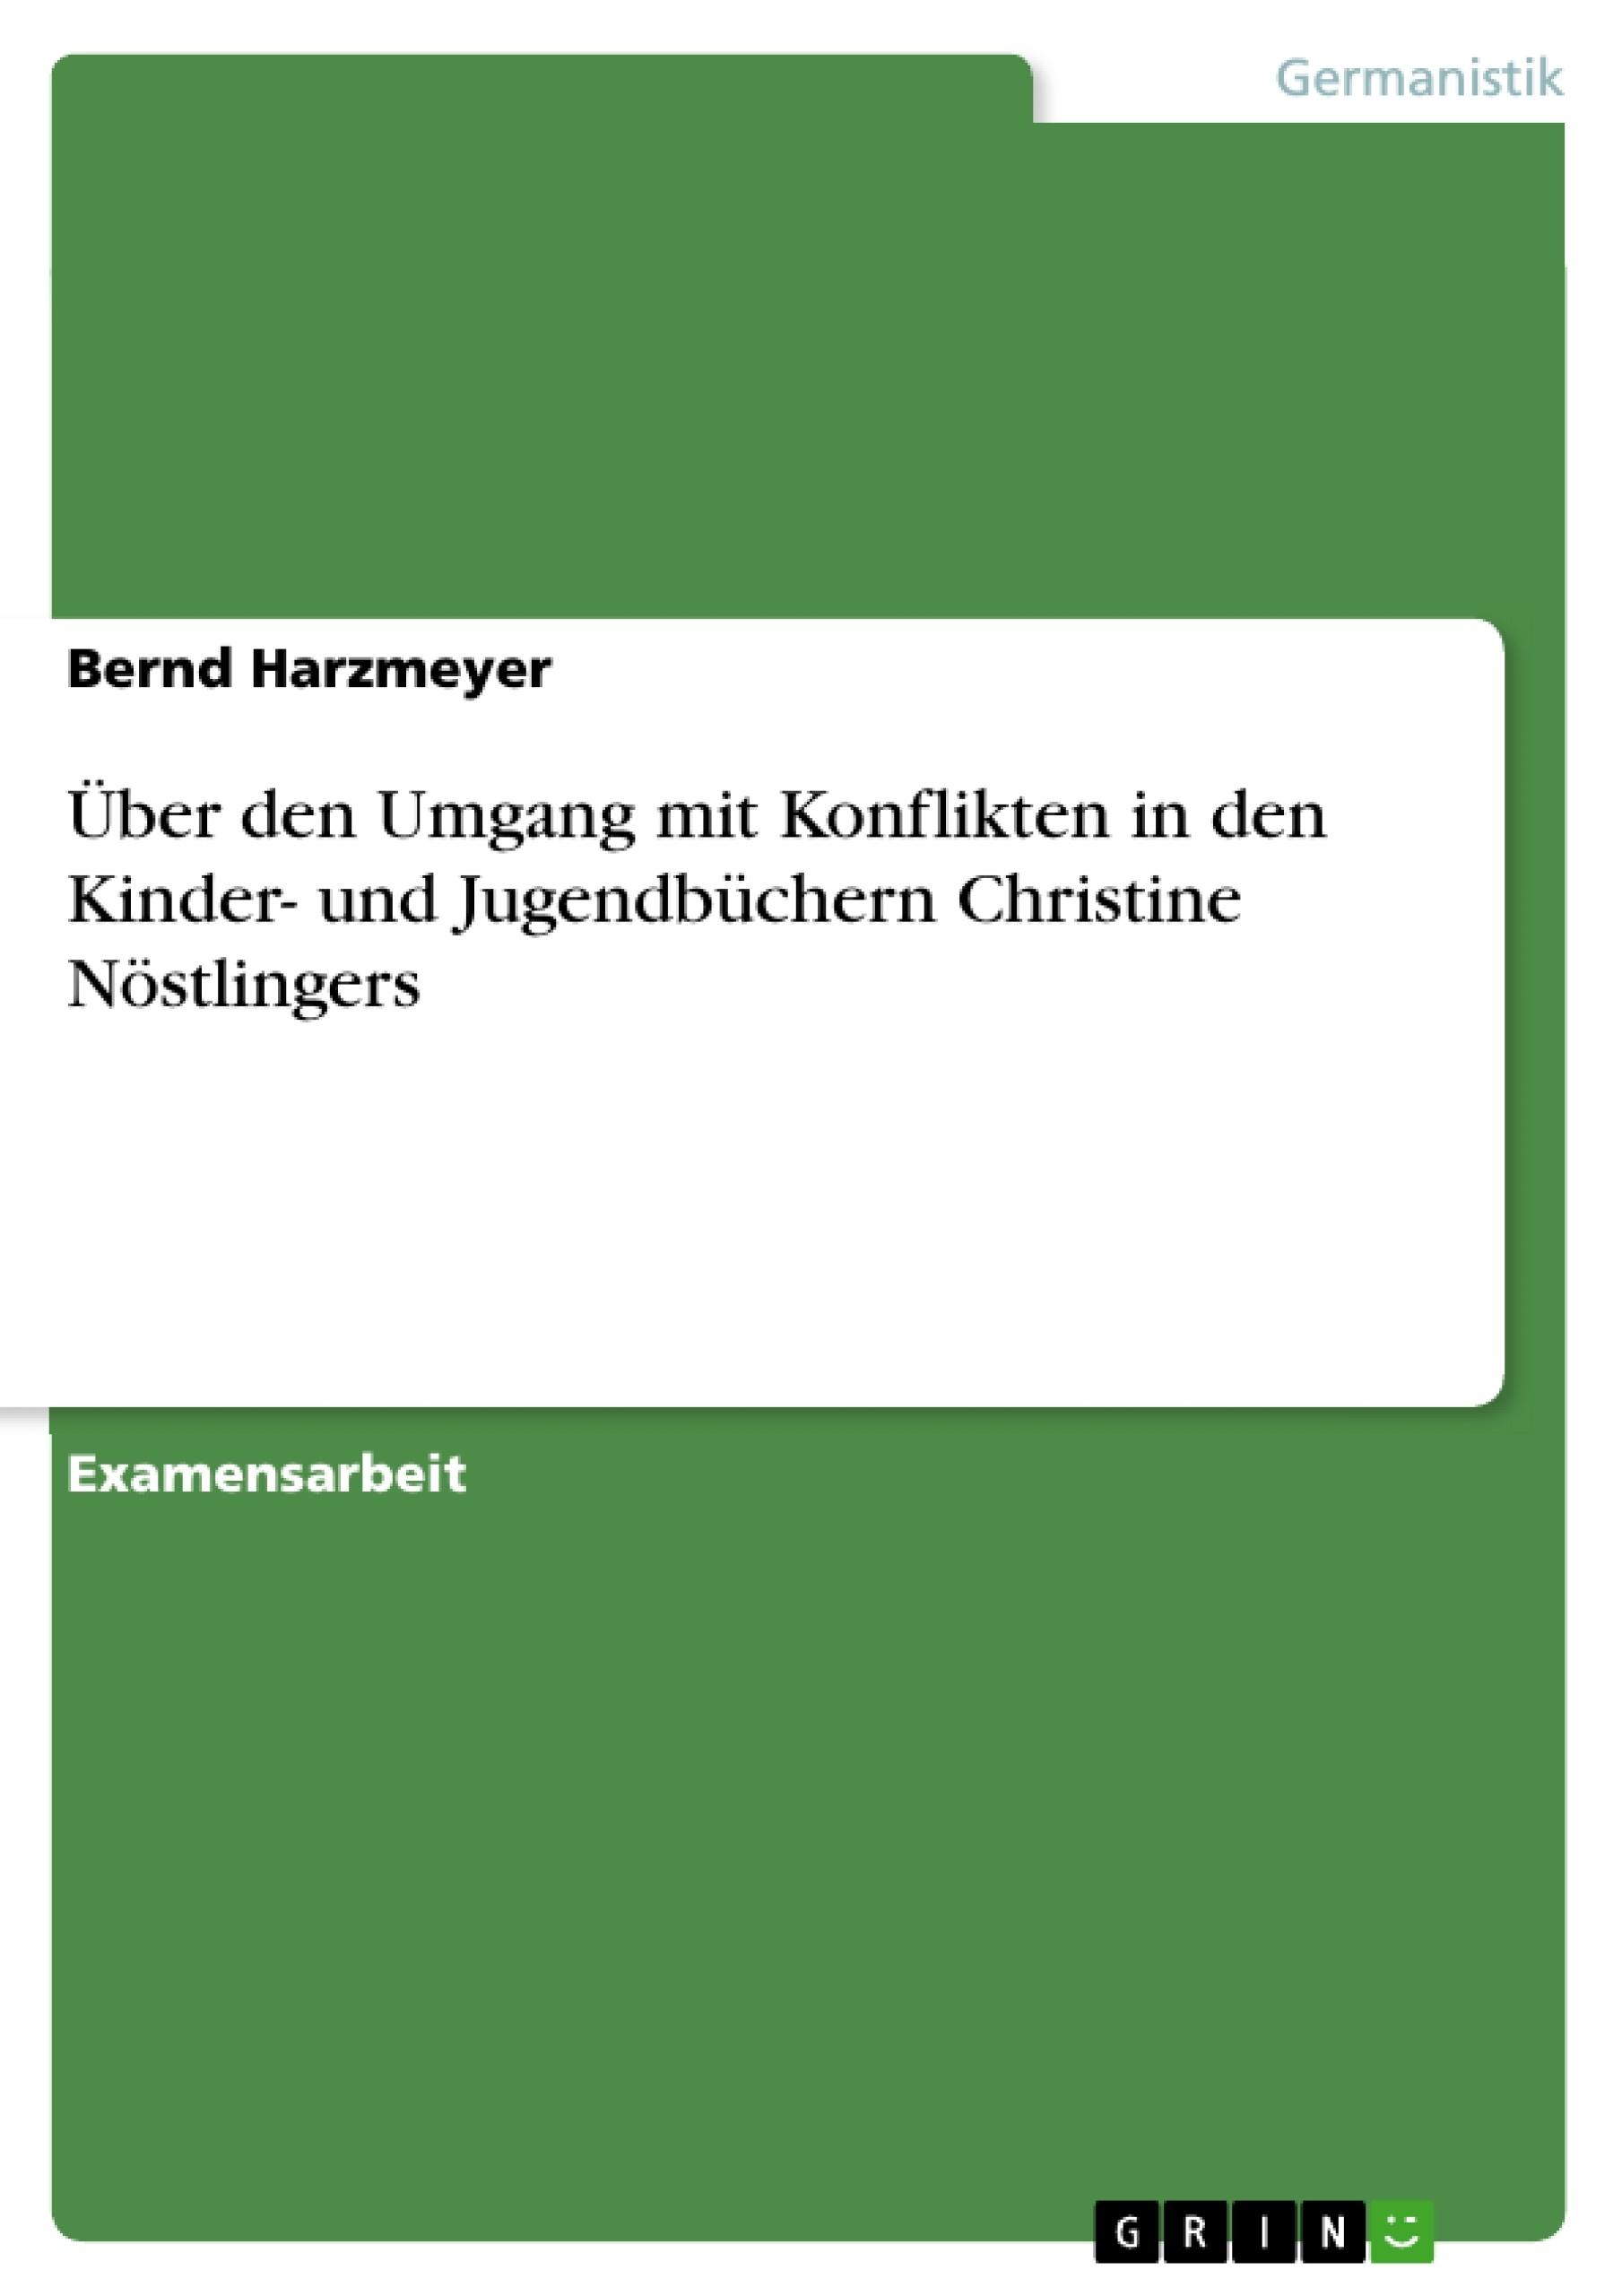 Titel: Über den Umgang mit Konflikten in den Kinder- und Jugendbüchern Christine Nöstlingers